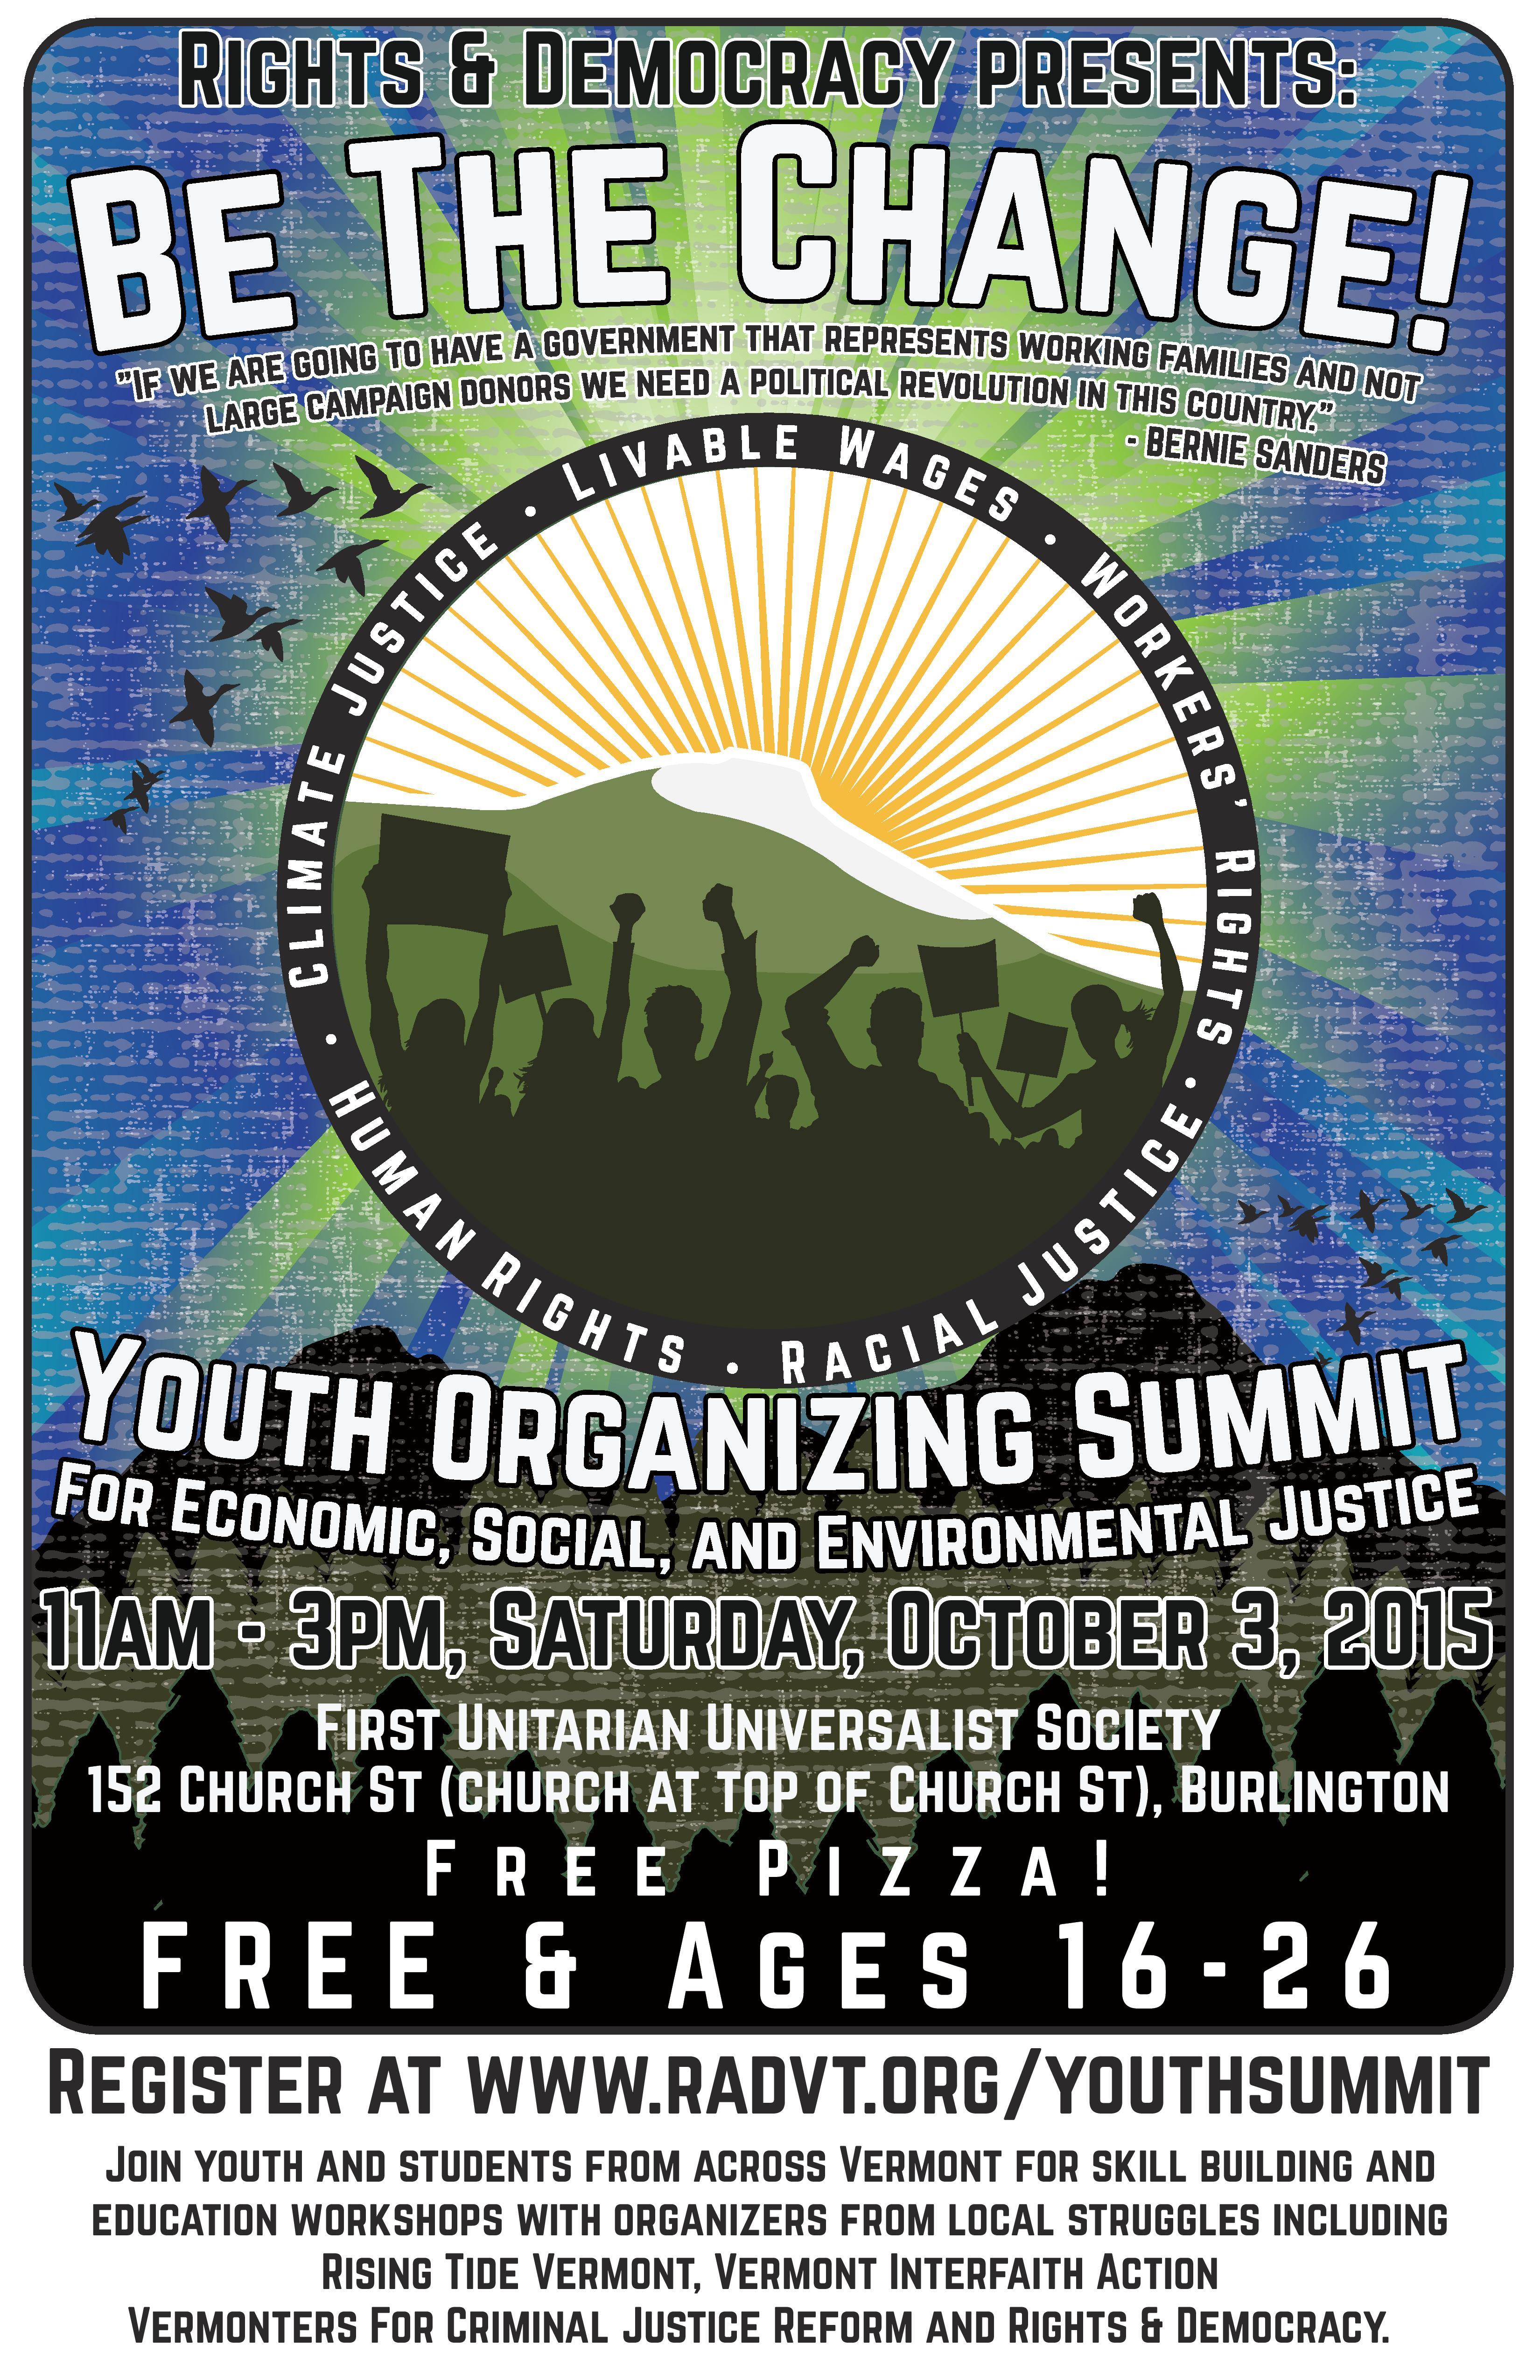 RAD_Youth_Organizing_Summit_Poster.jpg